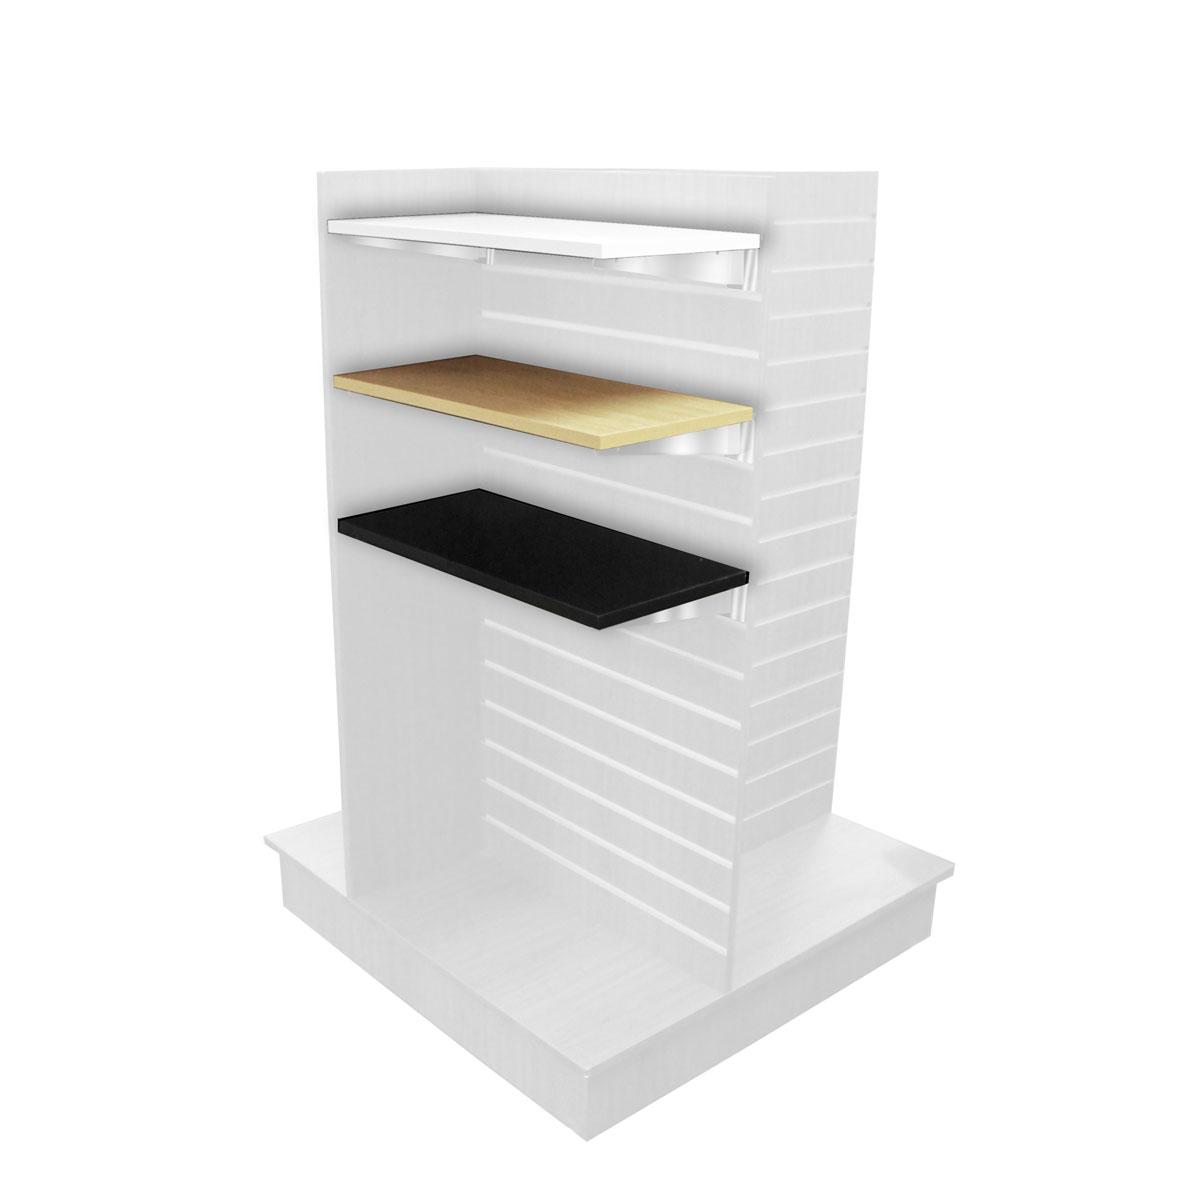 Wood Shelf For 24″ Wide Slatwall Displays